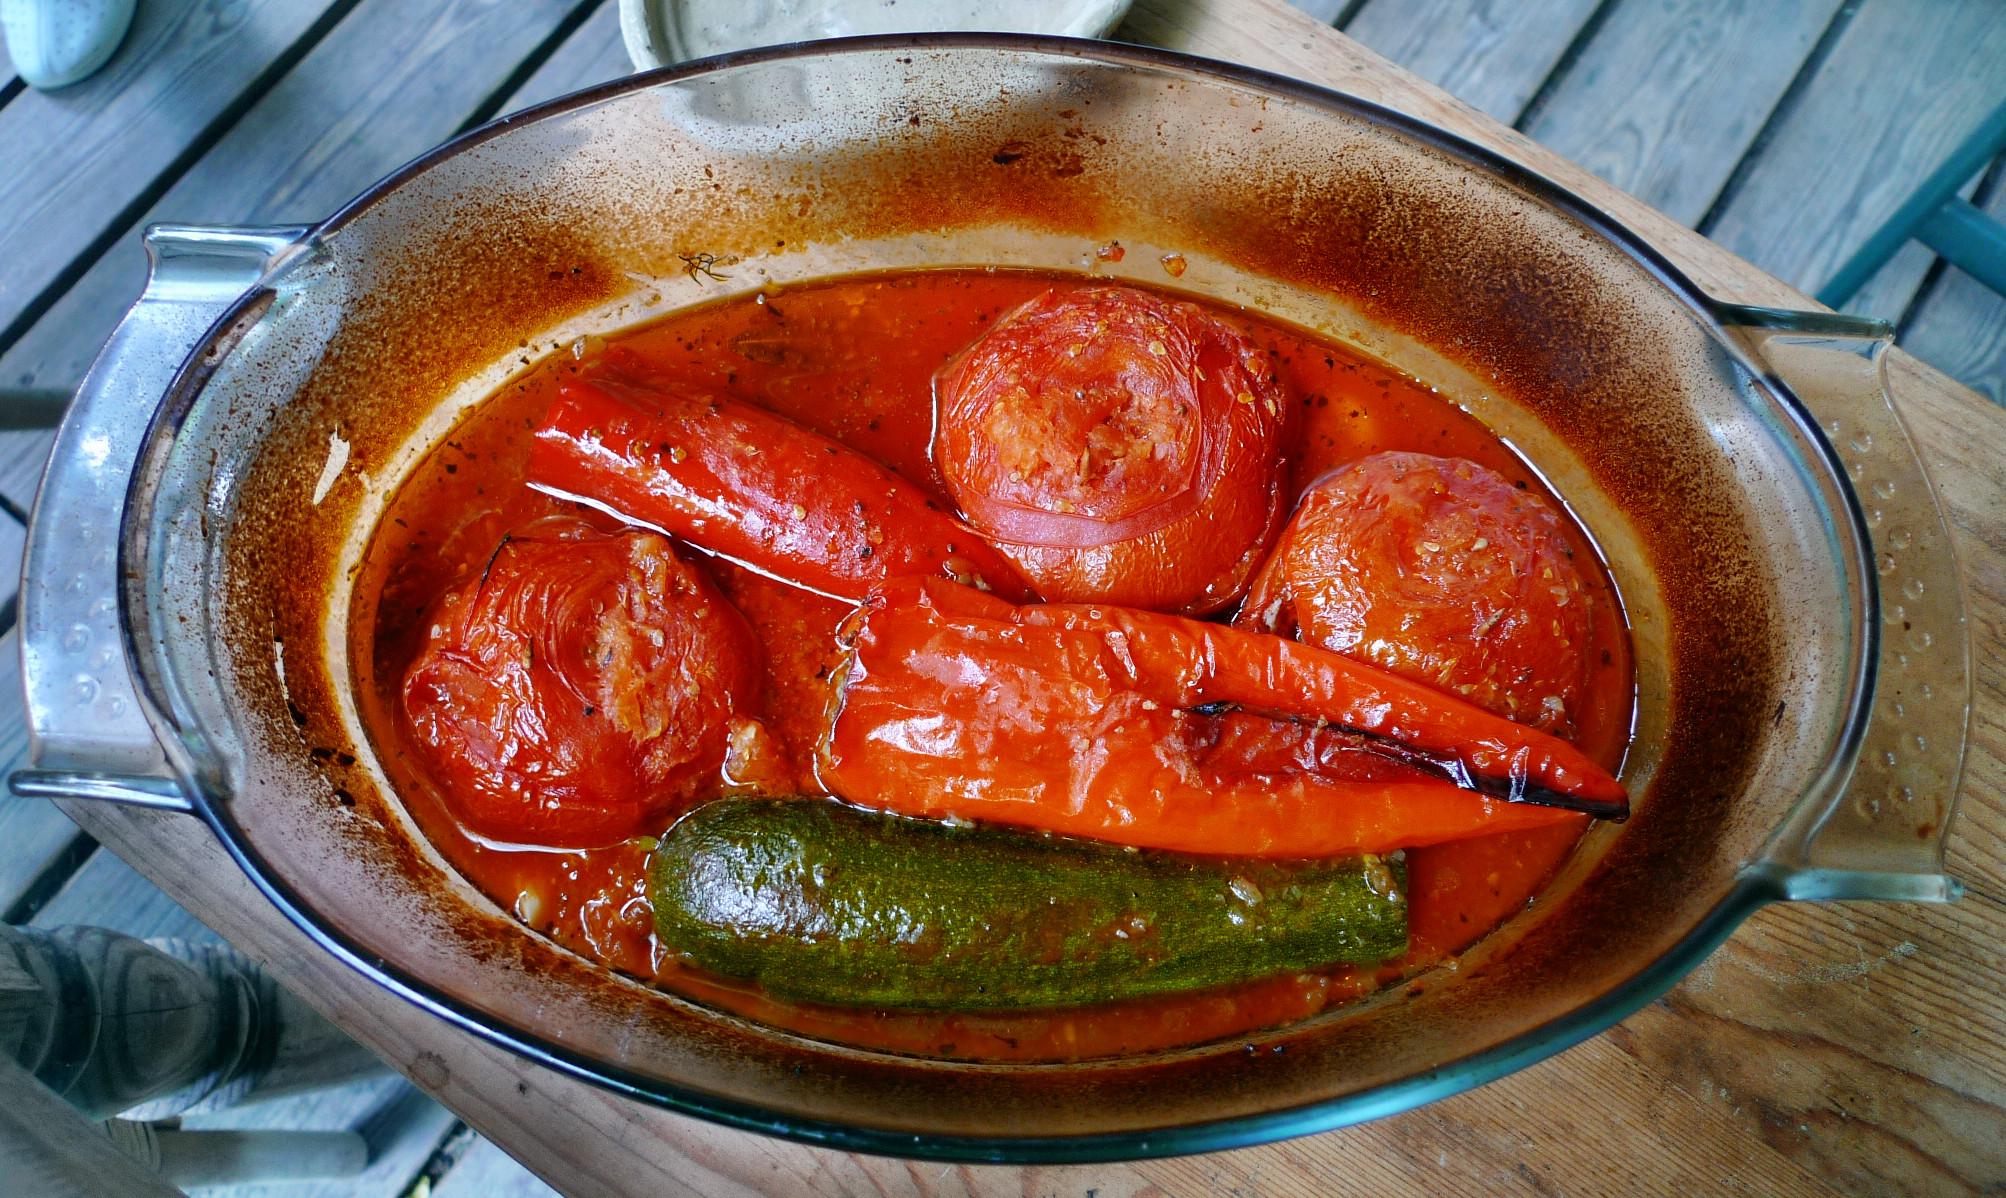 Fefüllte Tomaten,Couscous - 22.5.15   (8)